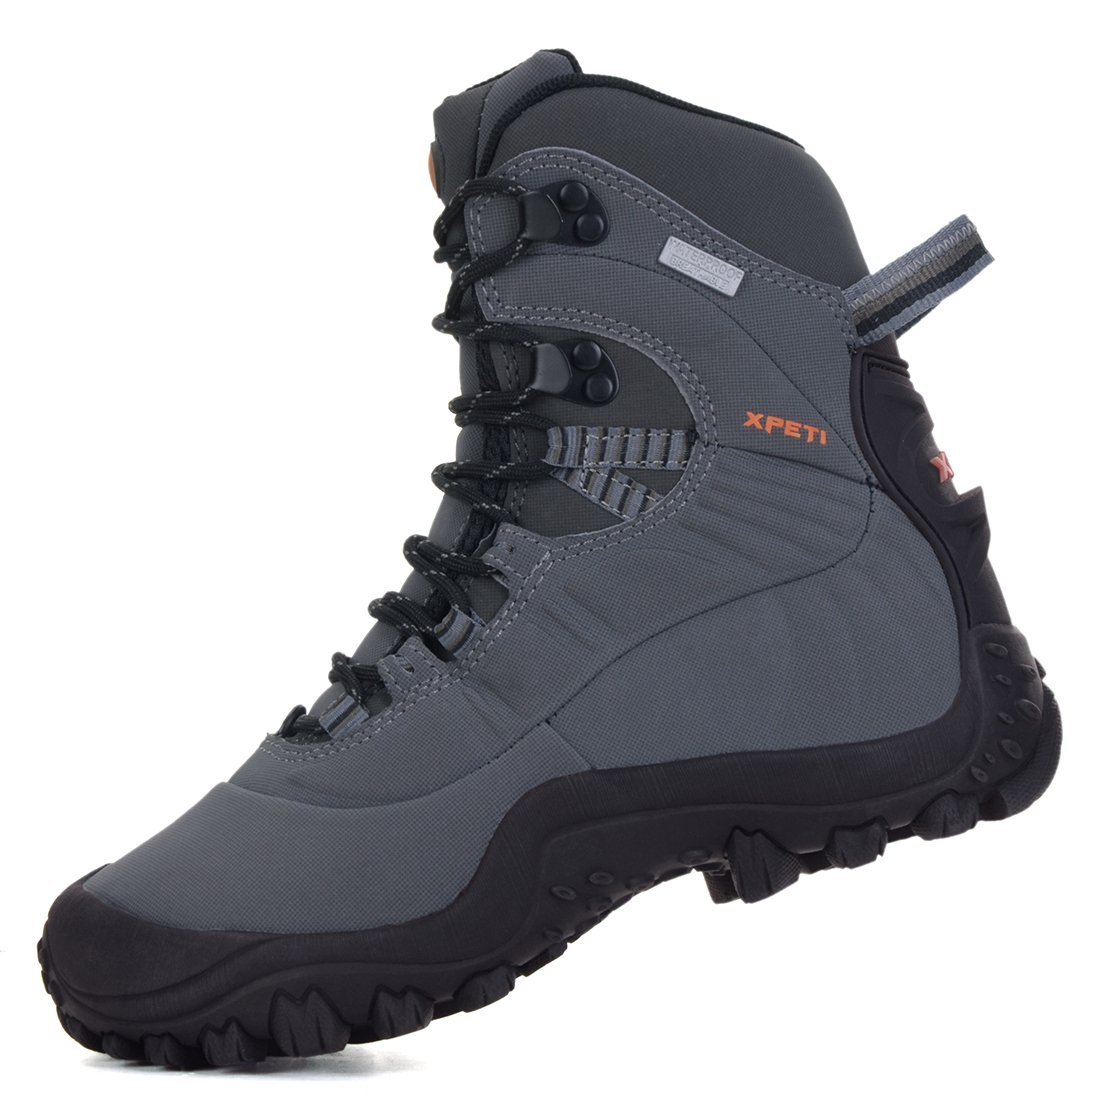 XPETI Women's Waterproof Mid High-Top Hiking Outdoor Boot B07F8KGZG3 9.5 B(M) US Light Grey